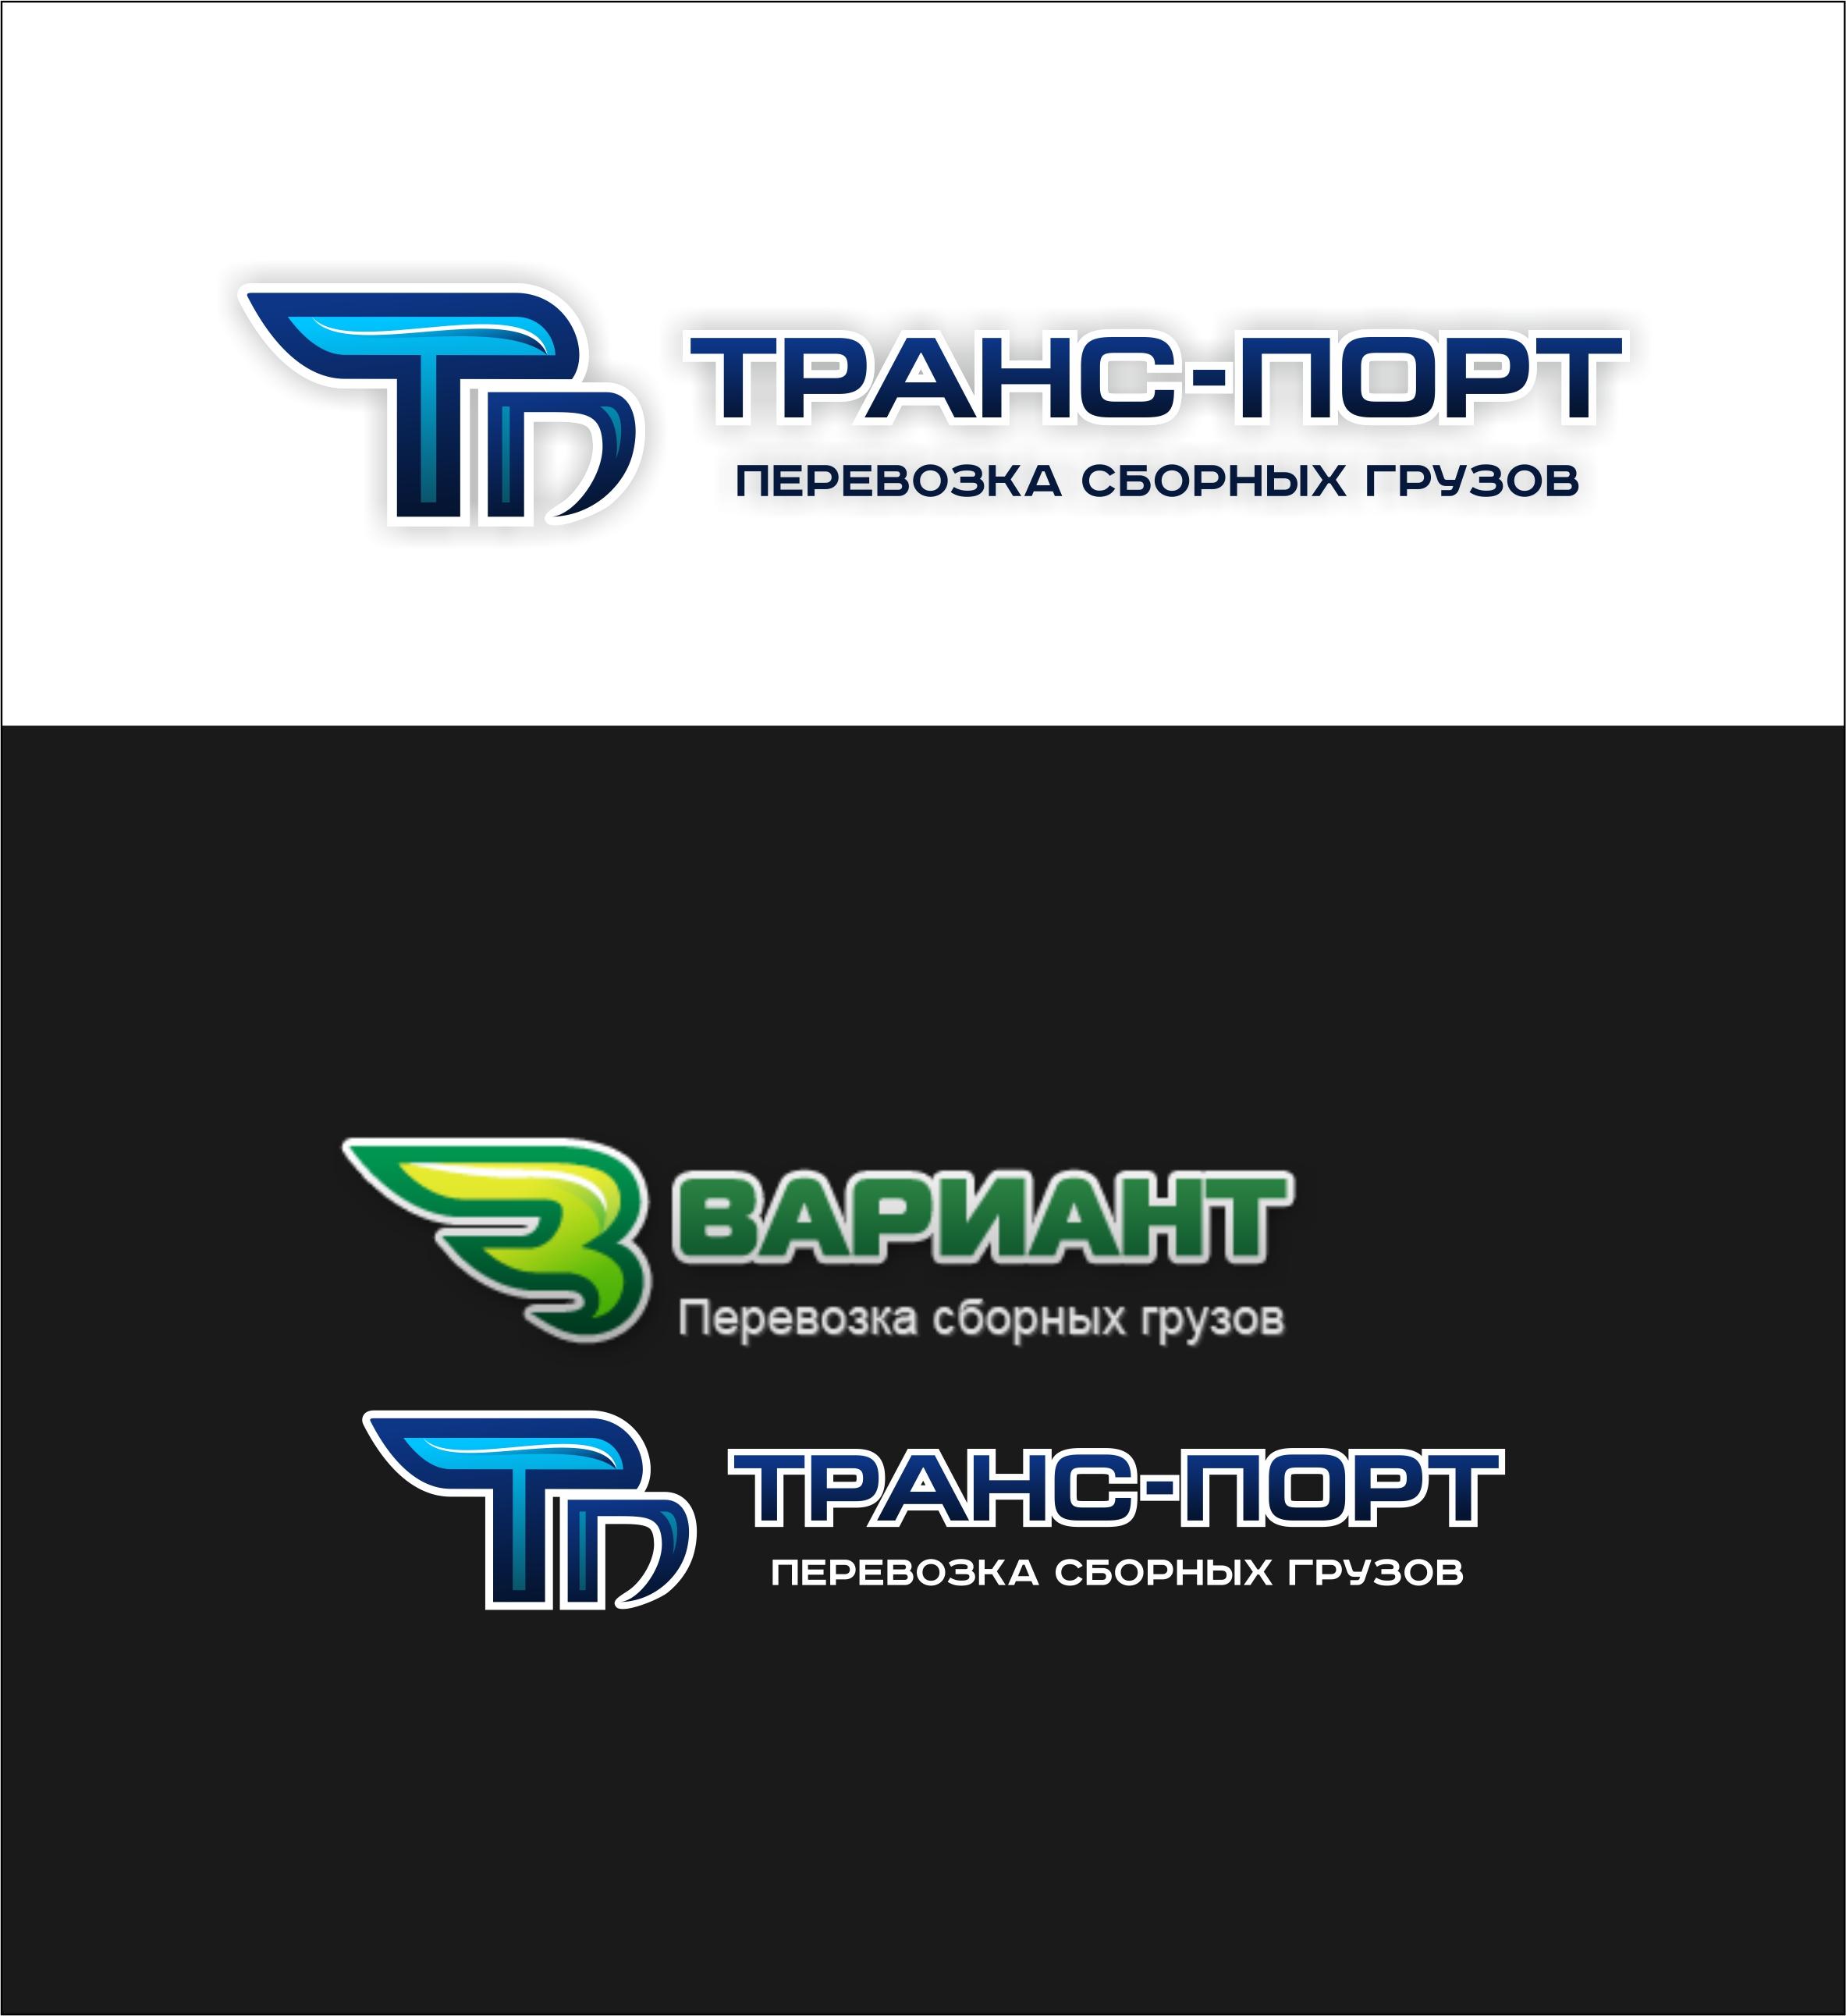 Разработка логотипа для логистической компании фото f_8545d28f13dd3eb1.jpg